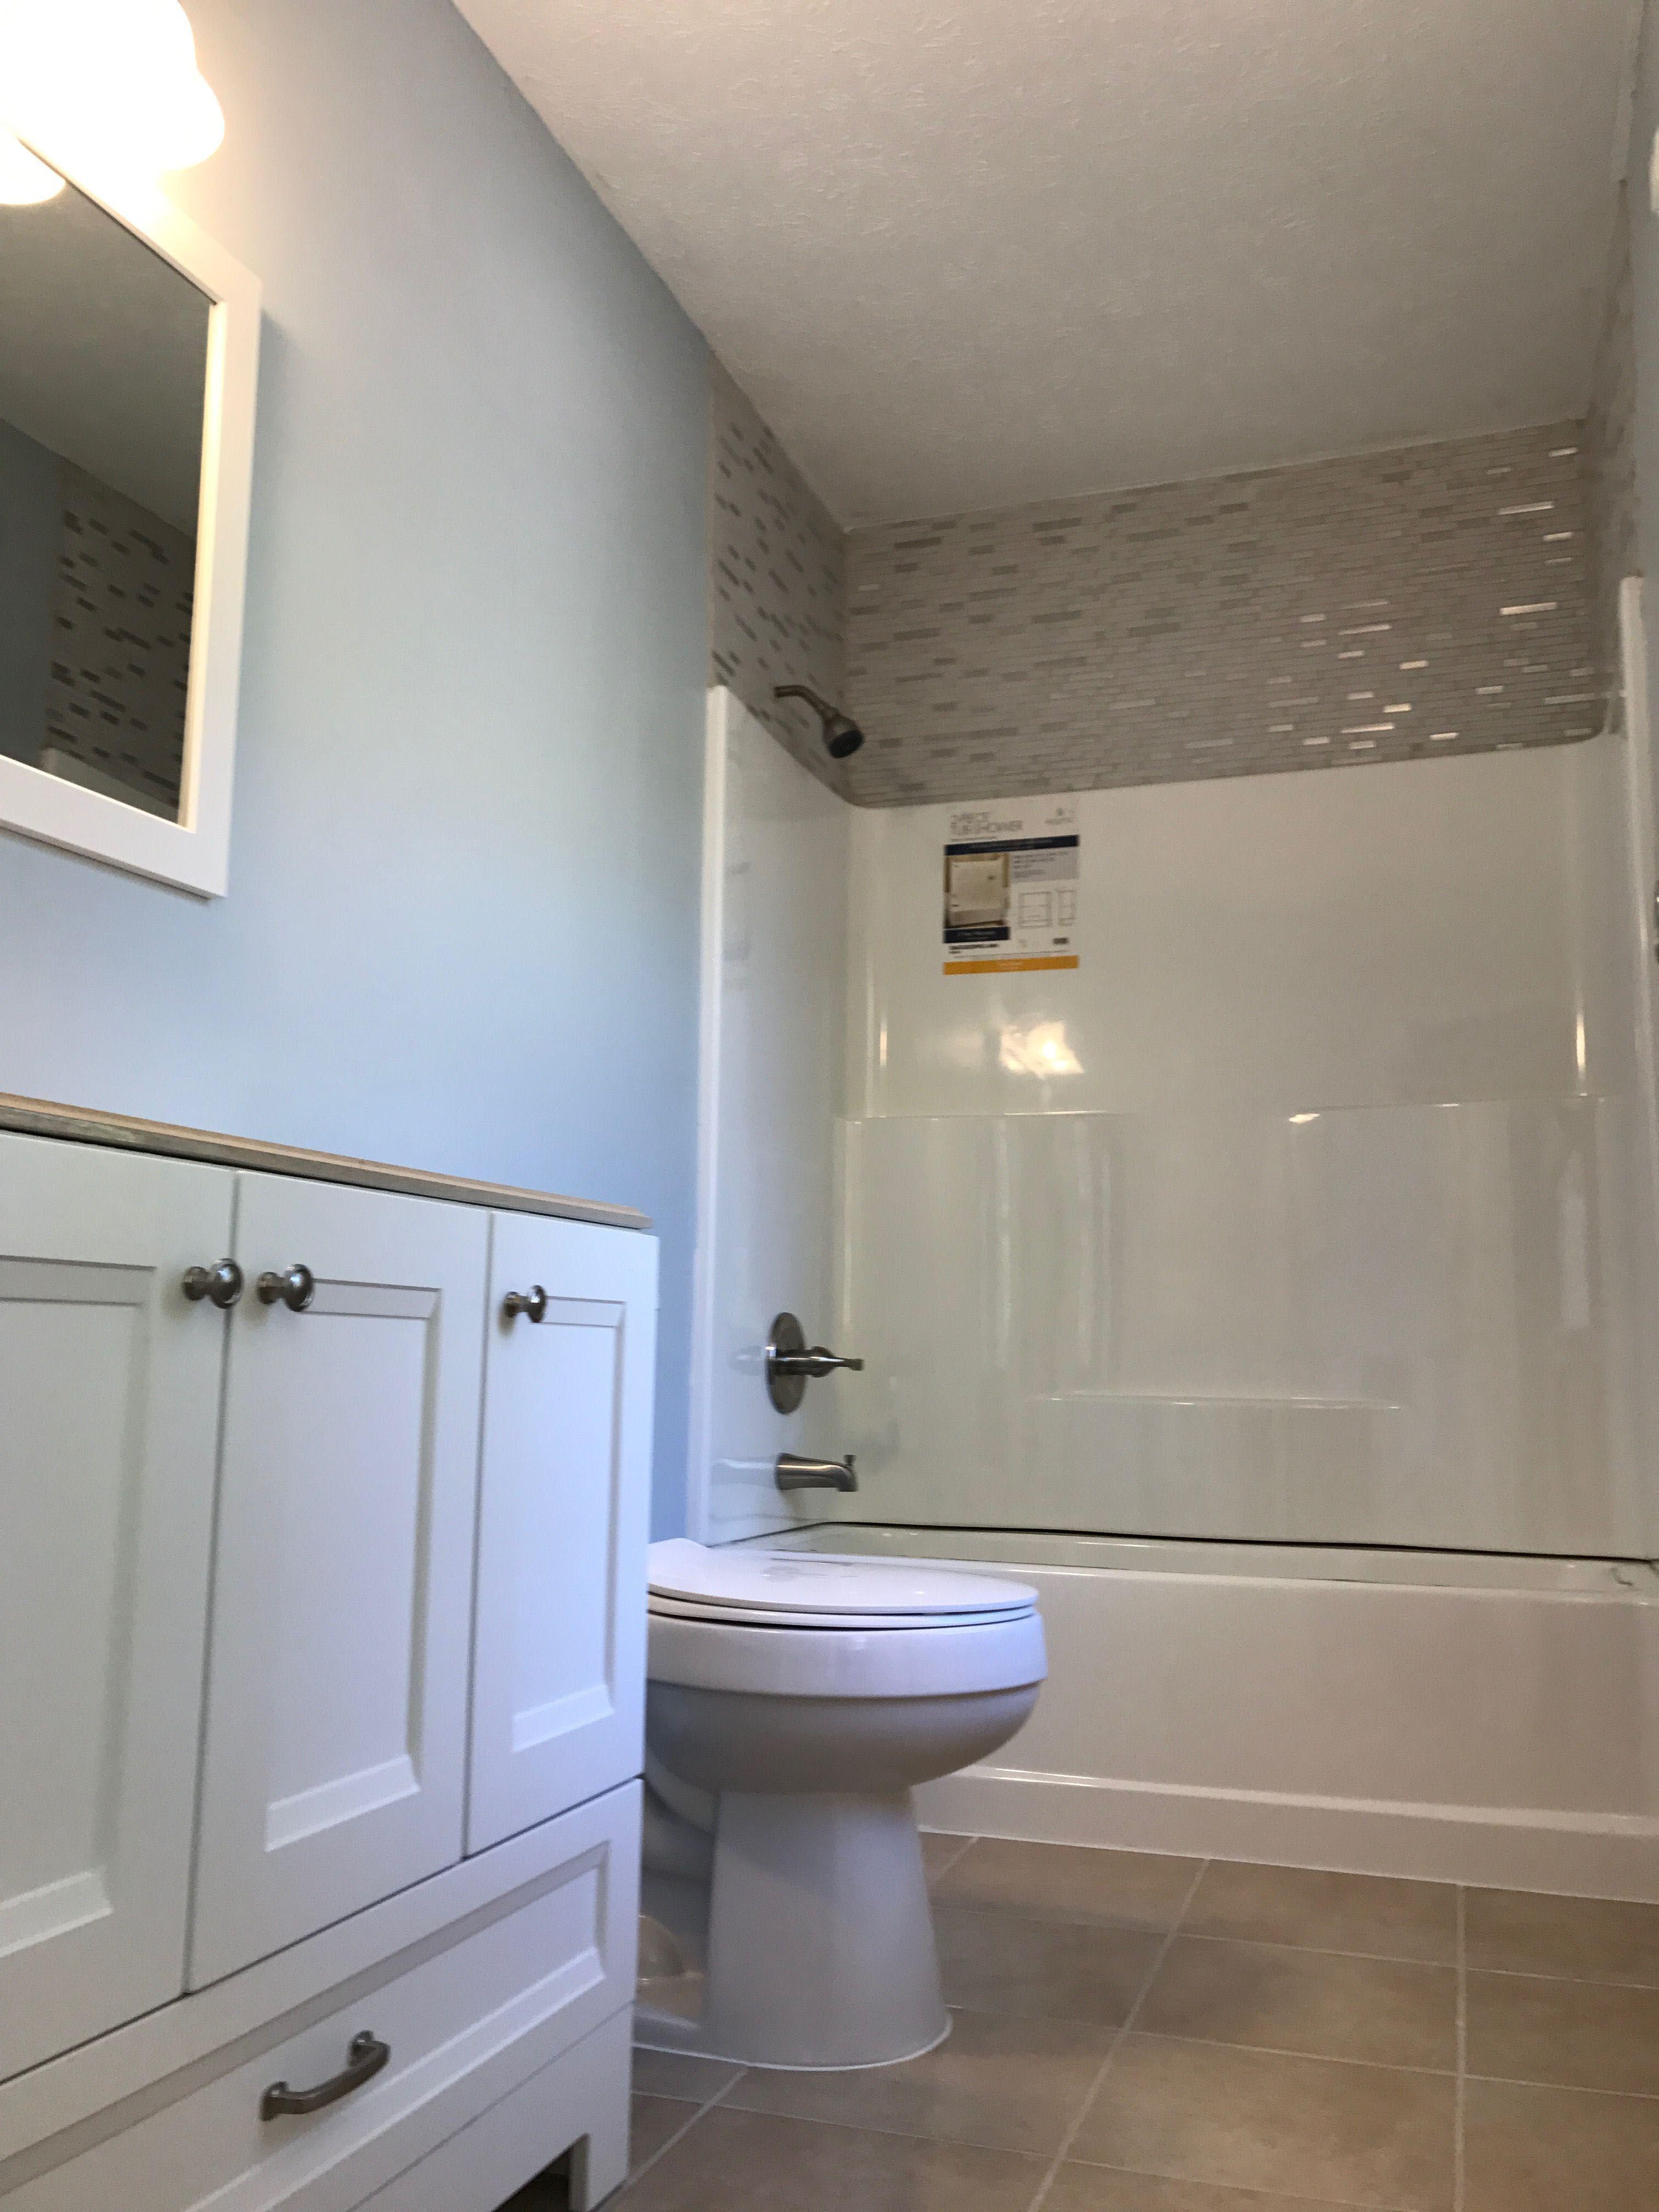 12 Brilliant Bathroom Light Fixture Ideas Home Depot Bathroom